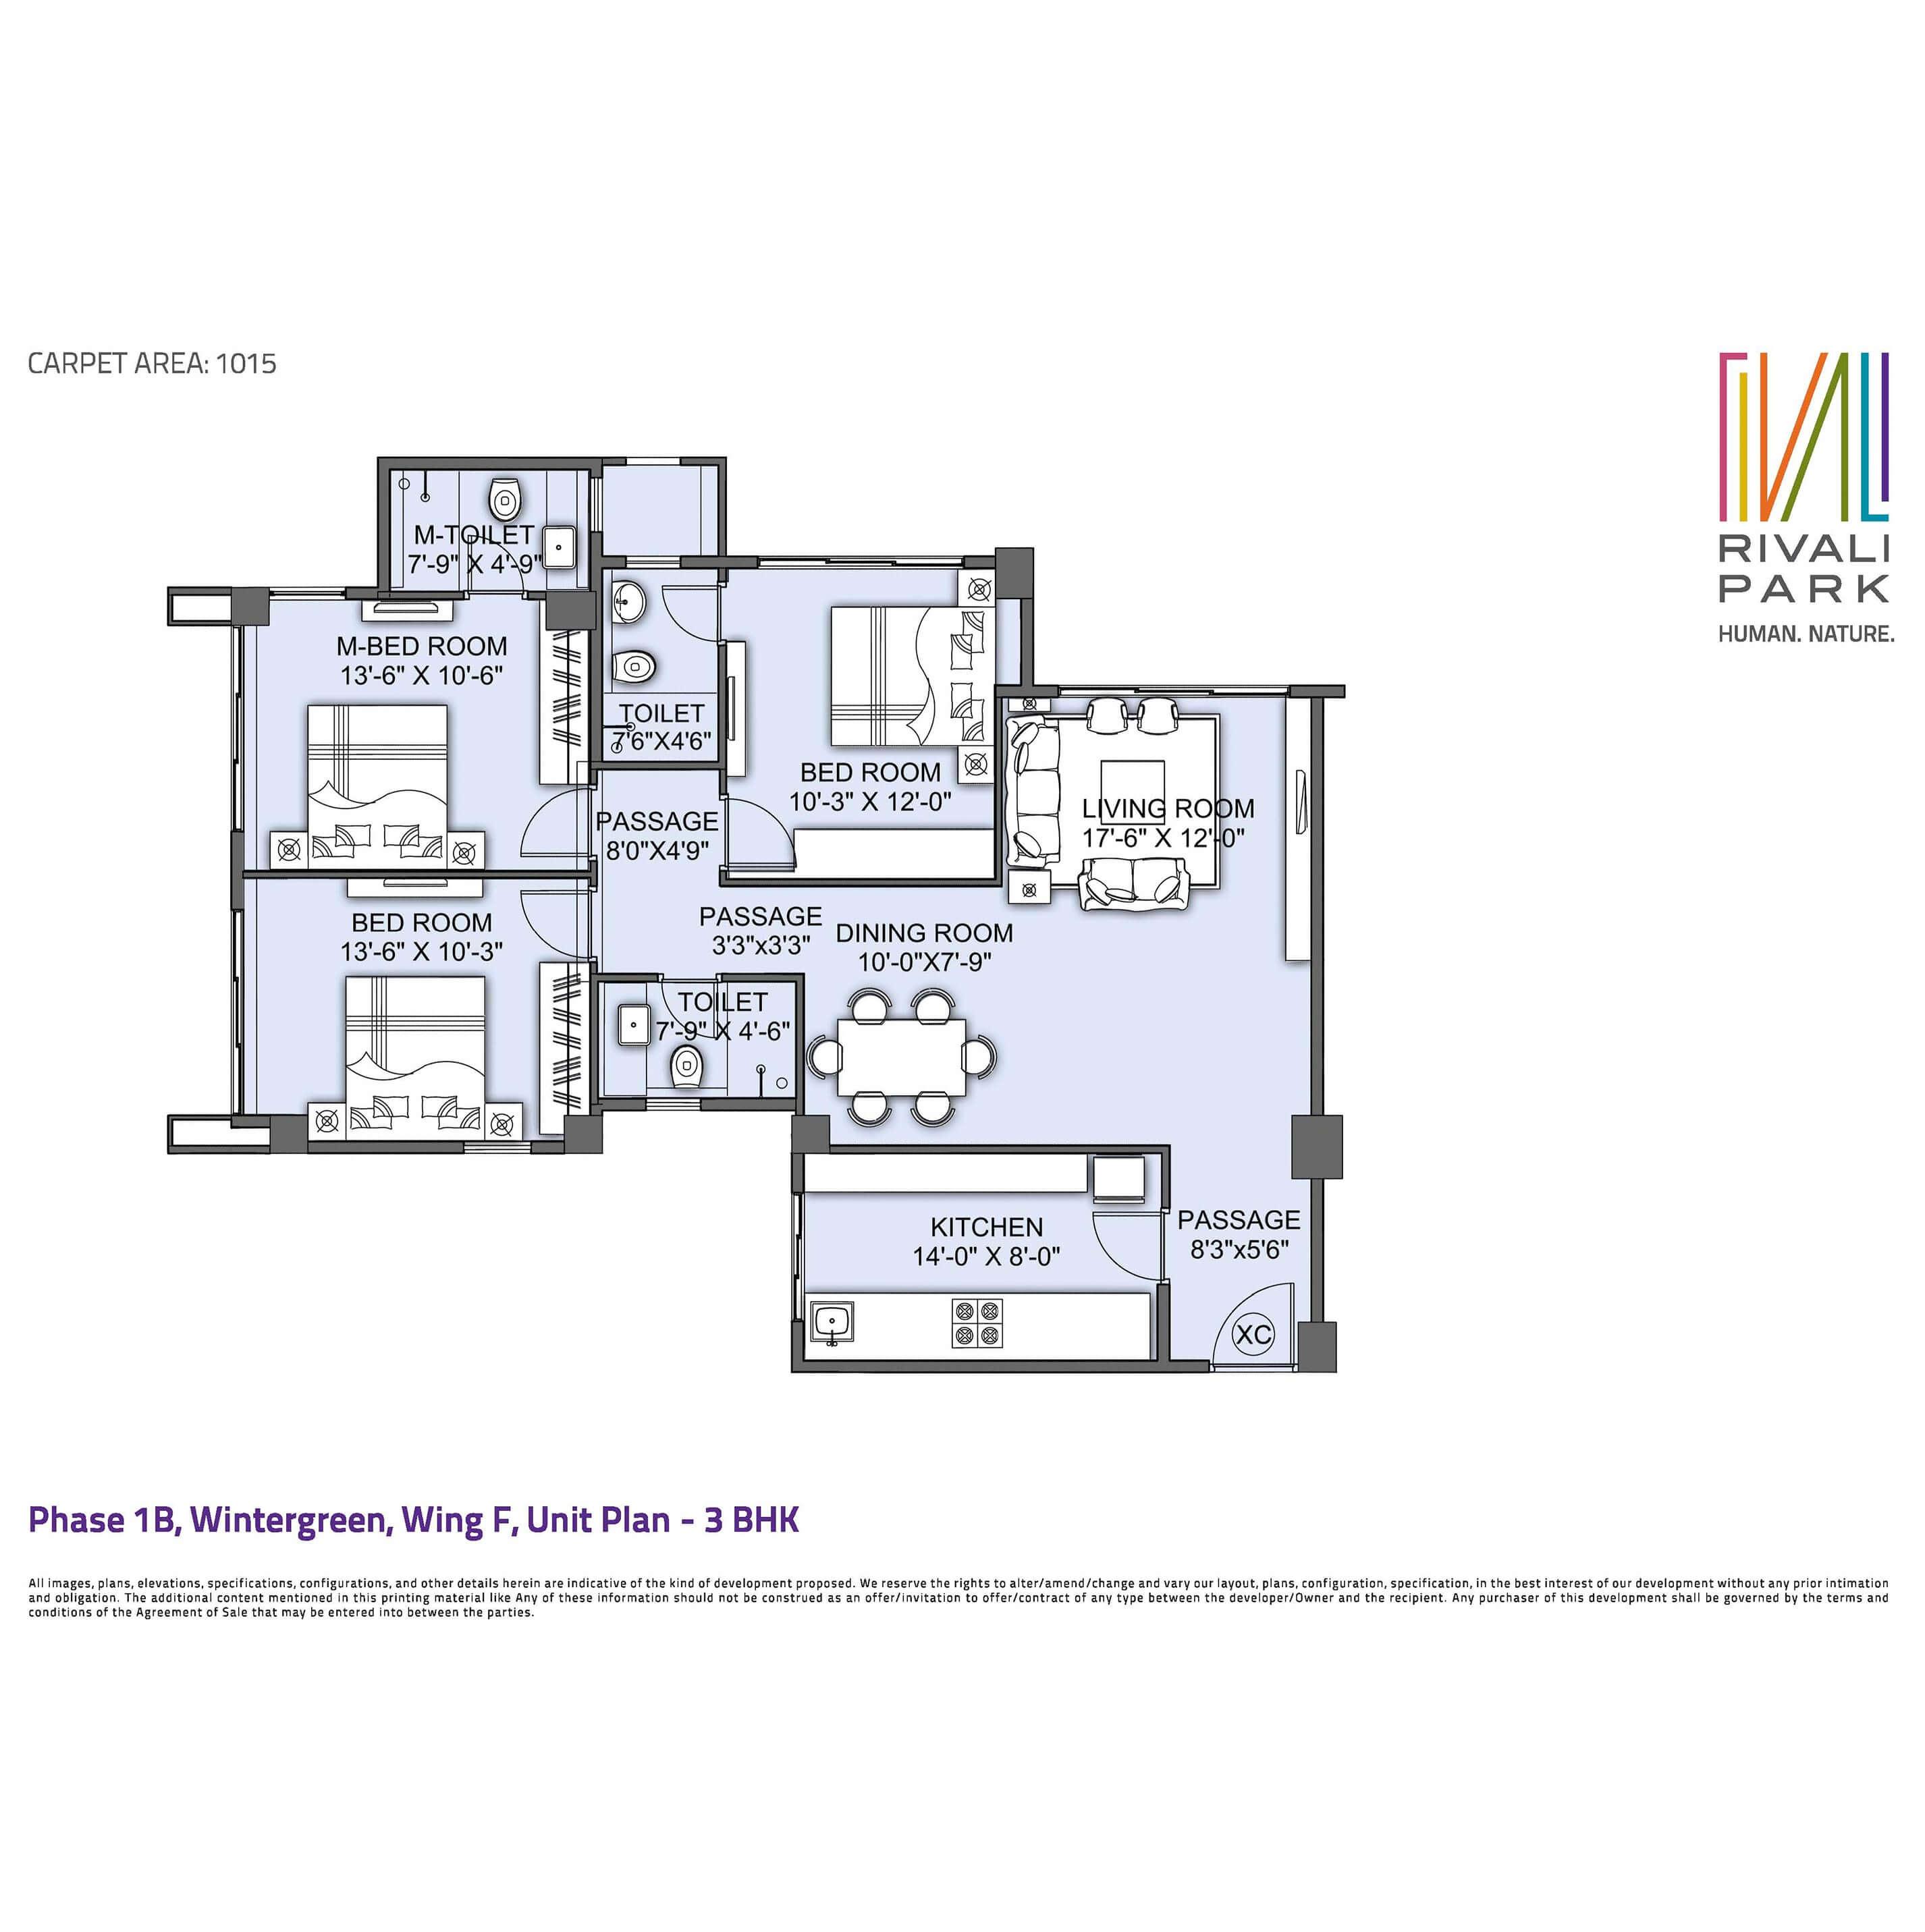 cci rivali park apartment 3bhk 1675sqft 1